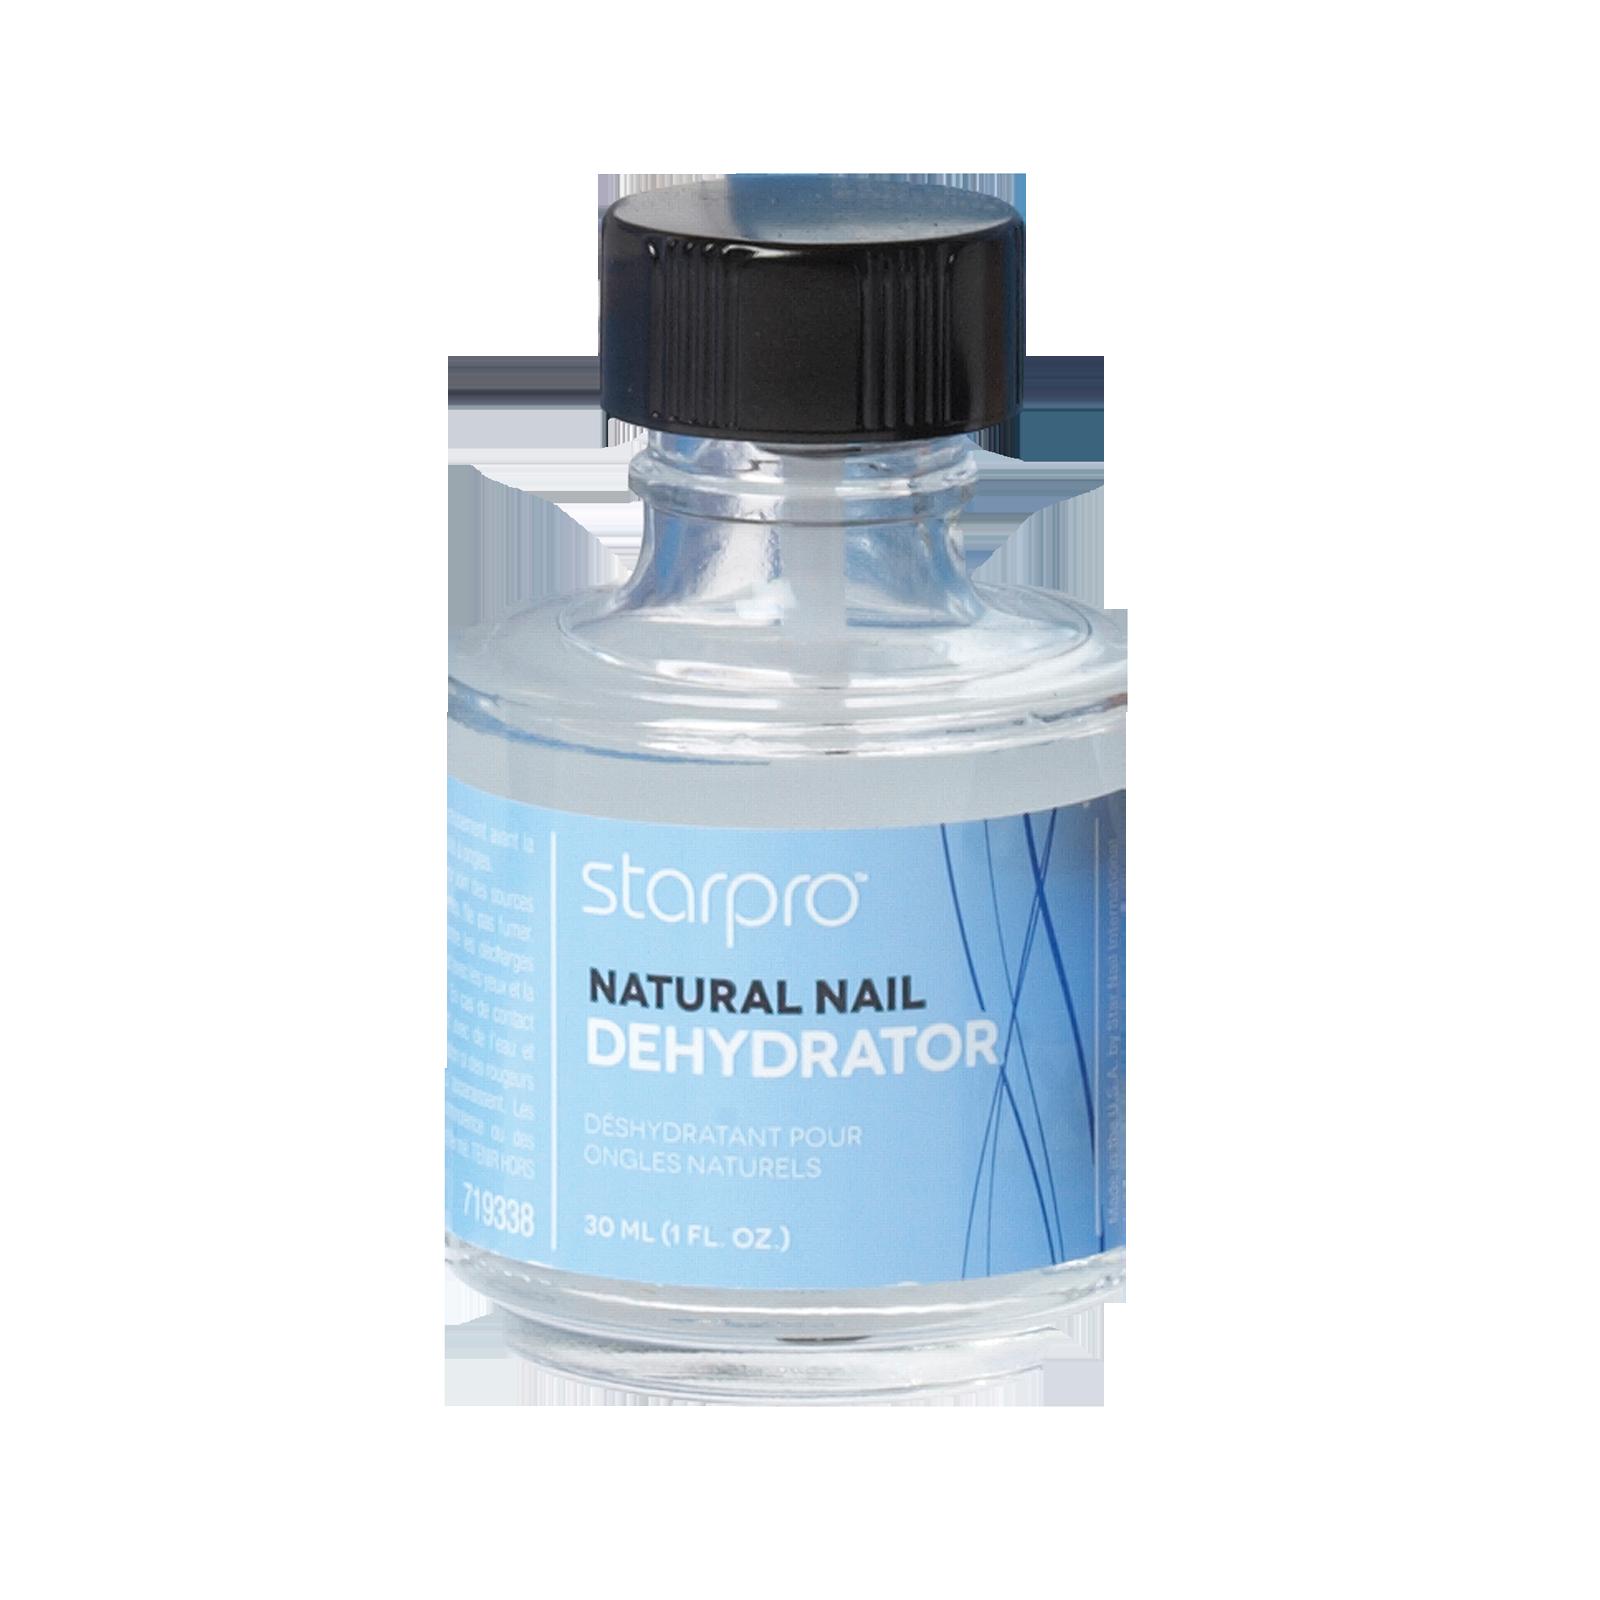 Nail Dehydrator - Cuccio Cina Pro Star Pro | CosmoProf